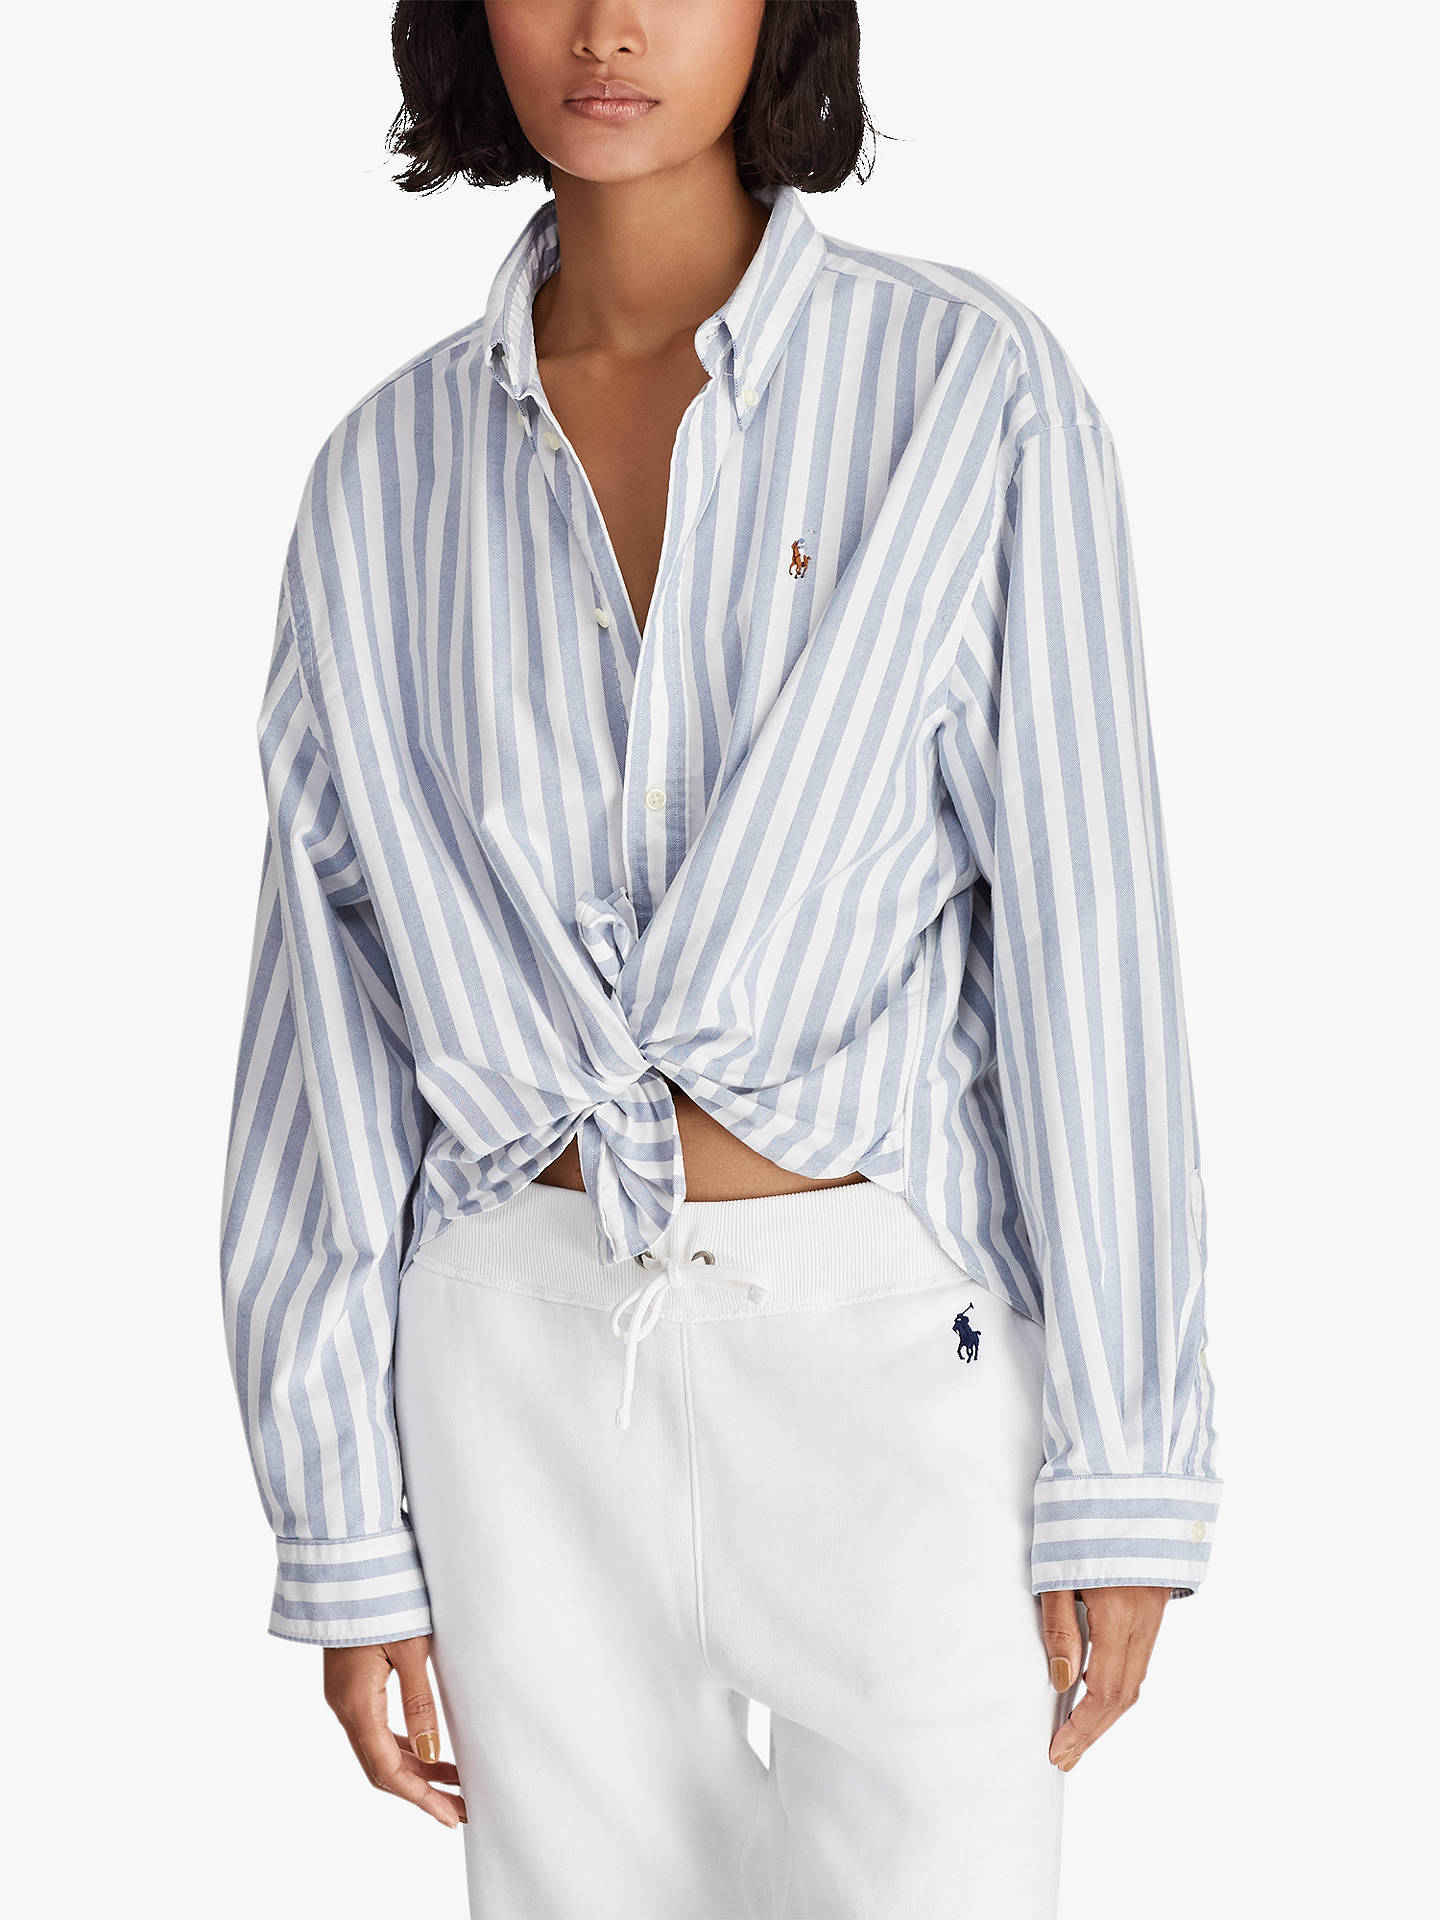 06d7fa1a07 Buy Polo Ralph Lauren Wide Stripe Cropped Oxford Shirt, White/Blue, XS  Online ...